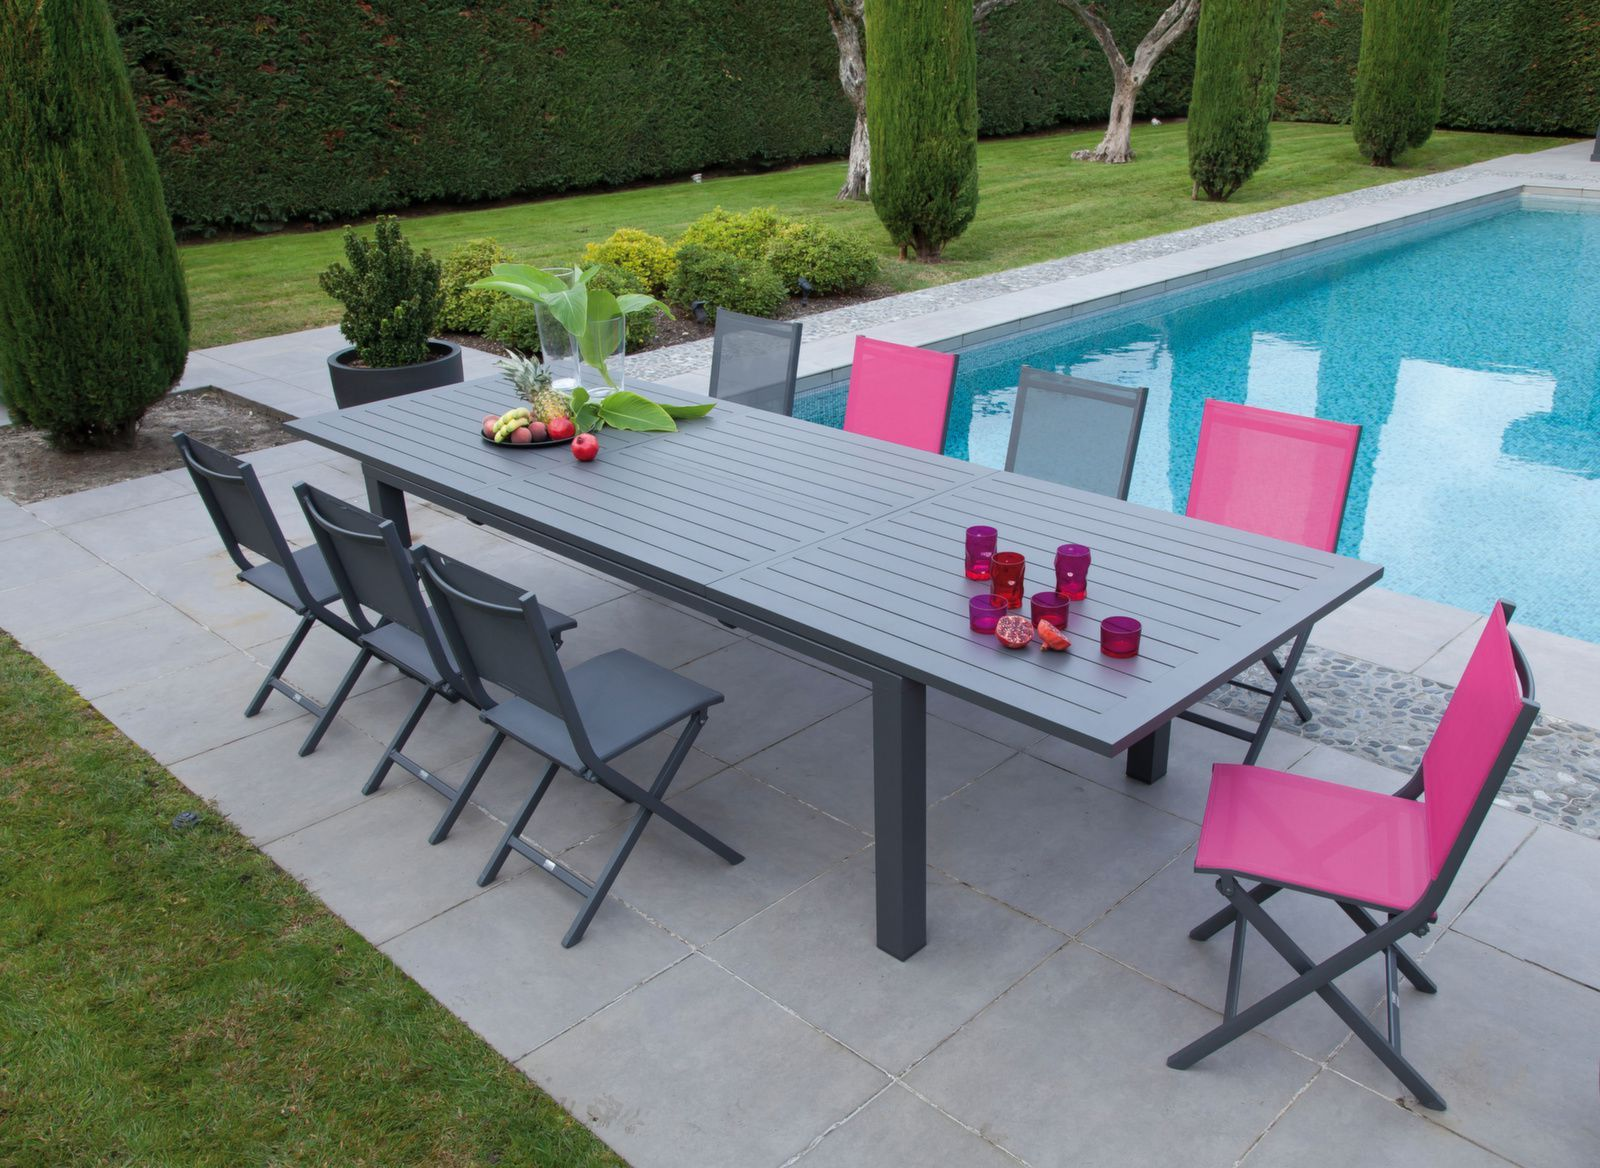 Table Elisa 220/320 cm | Mobilier de jardin - repas 2018 | Outdoor ...